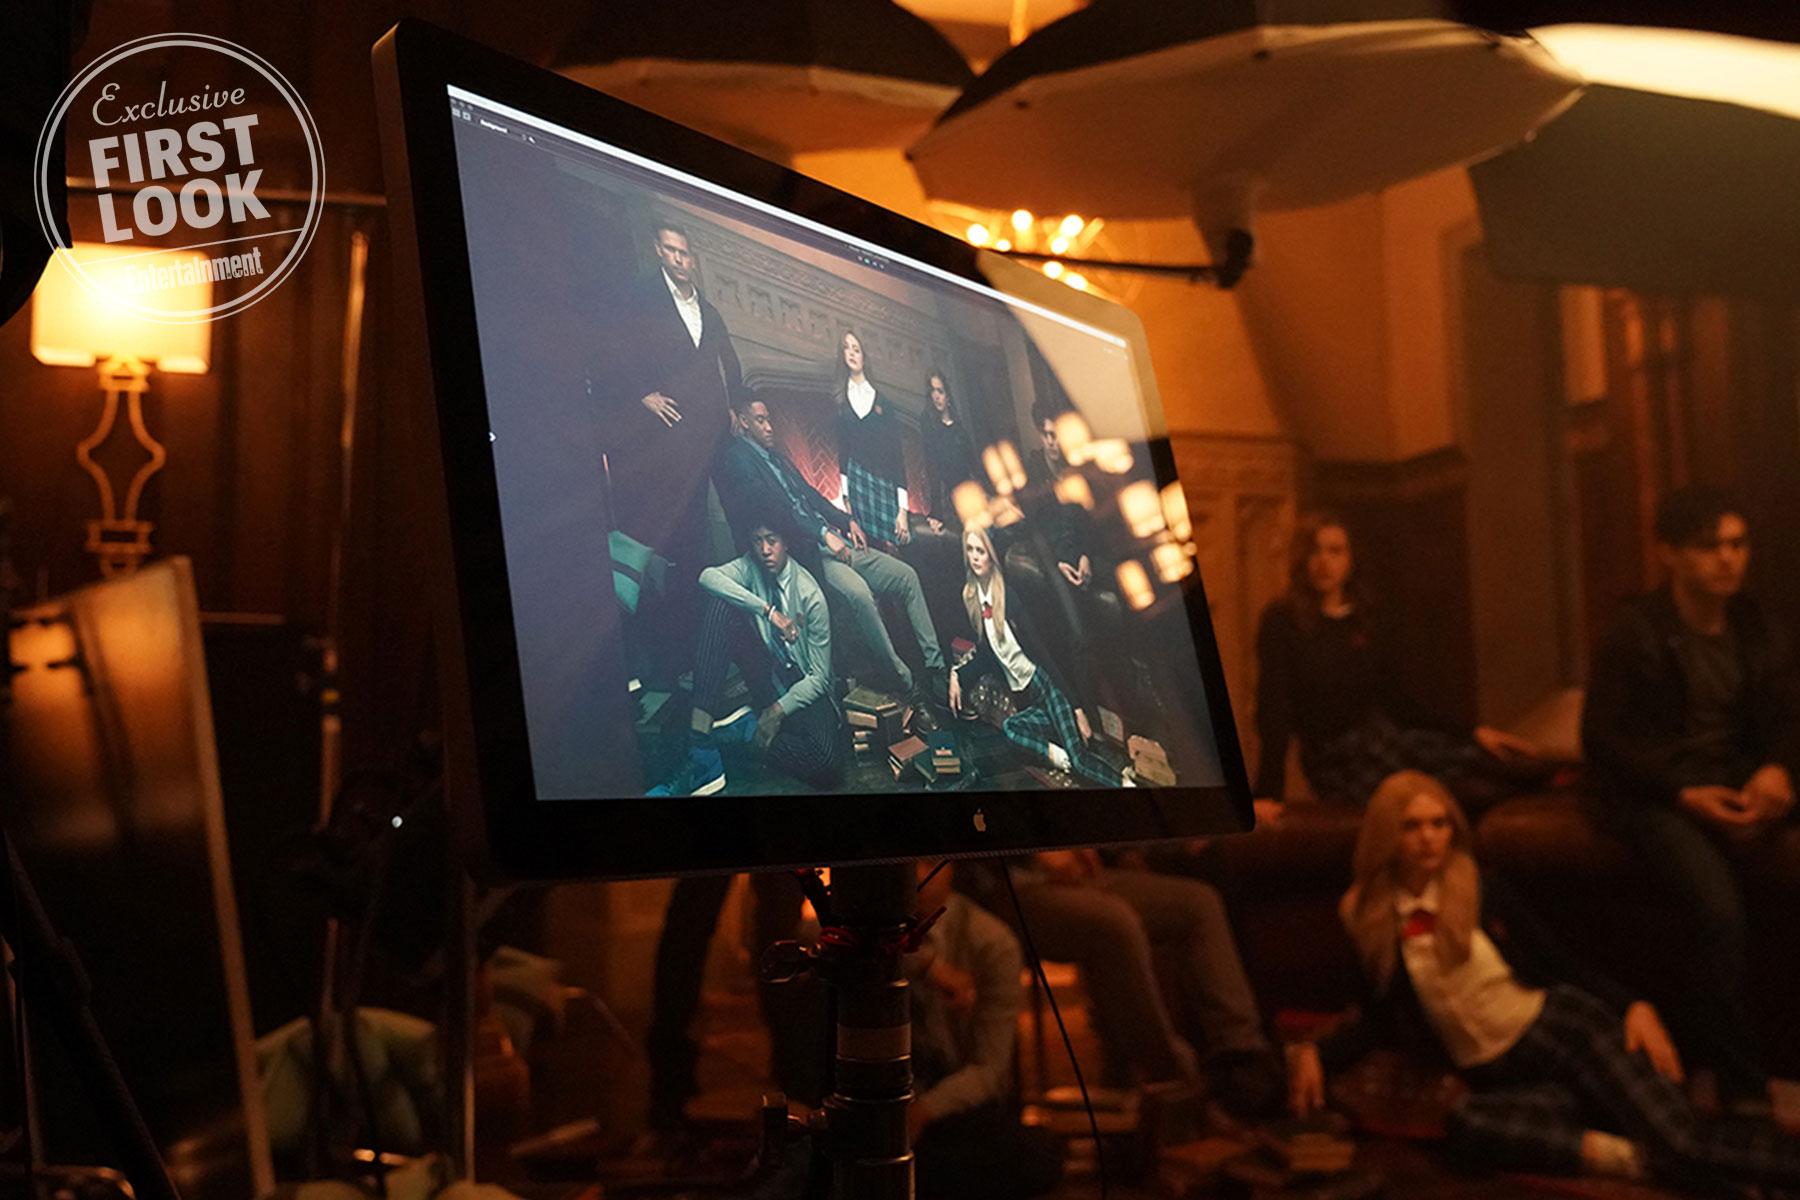 Alaric Saltzman (Matthew Davis), Milton Gladston, a.k.a. MG (Quincy Fouse), Rafael (Peyton Alex Smith), Hope Mikaelson (Danielle Rose Russell), Josie Saltzman (Kaylee Bryant), Lizzie Saltzman (Jenny Boyd), Landon Kirby (Aria Shahghasemi)